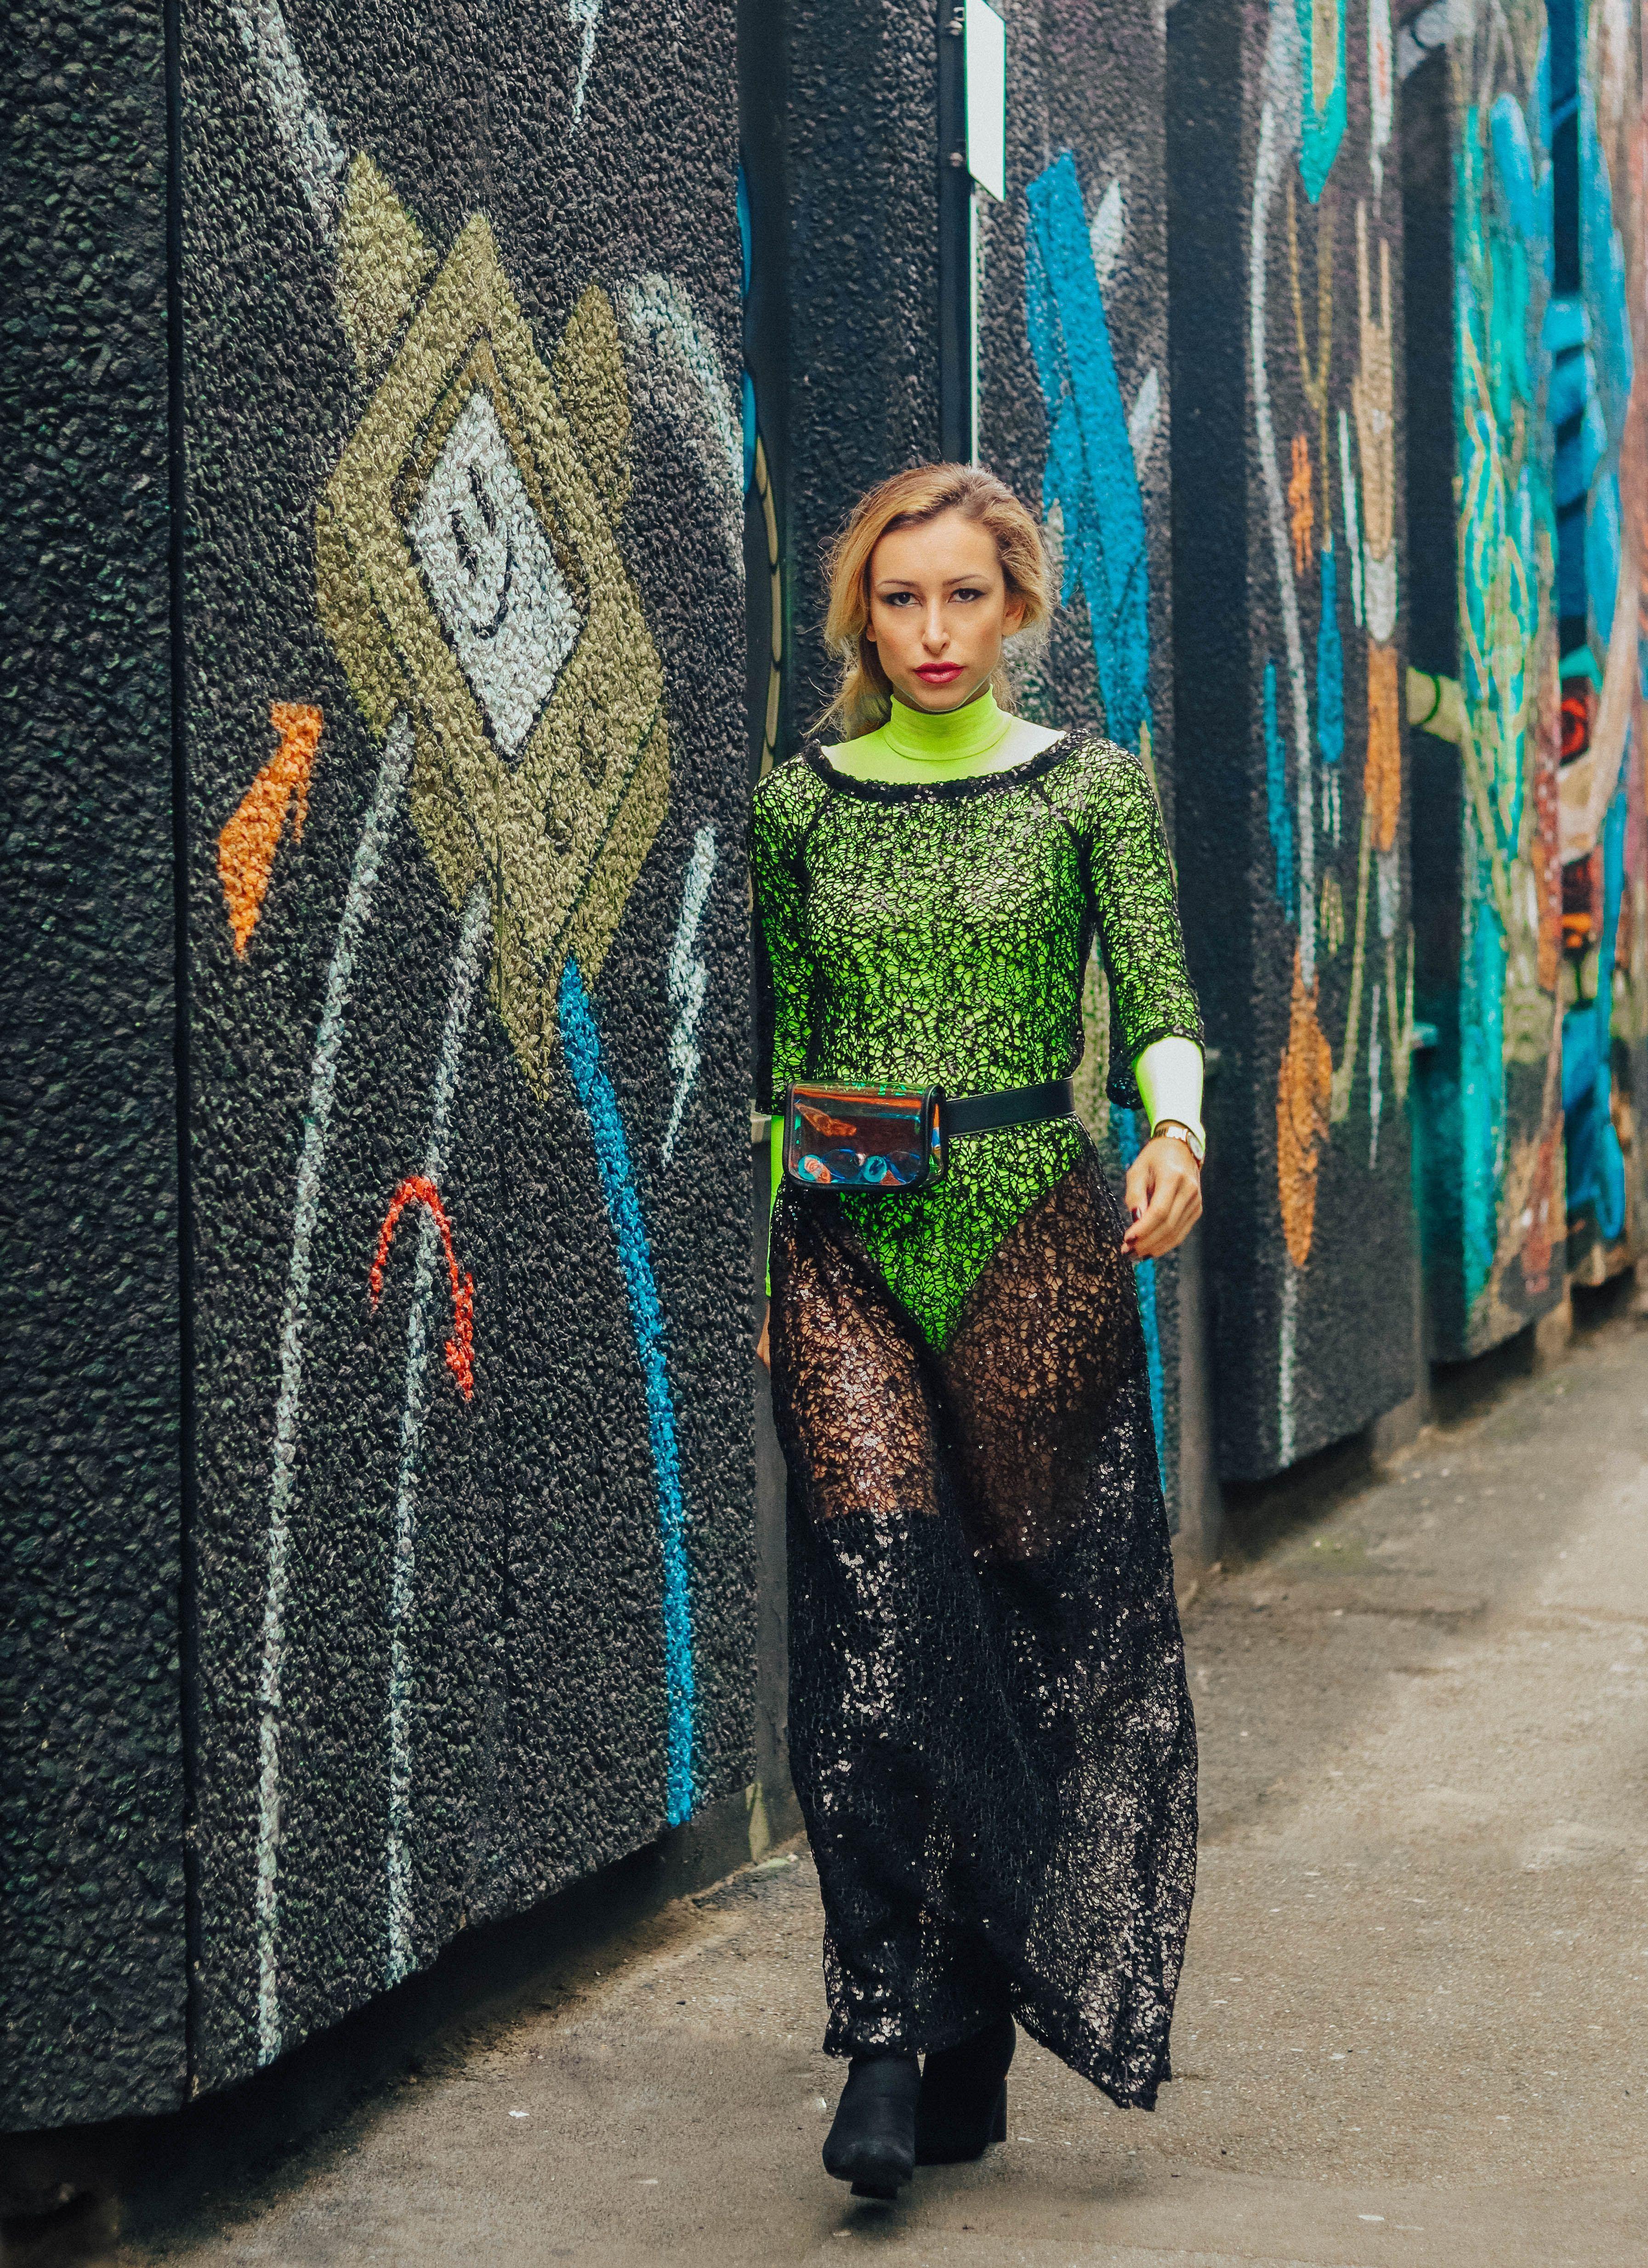 London Fashion Week 2019 7 London Fashion Week Women 2019 Fashion